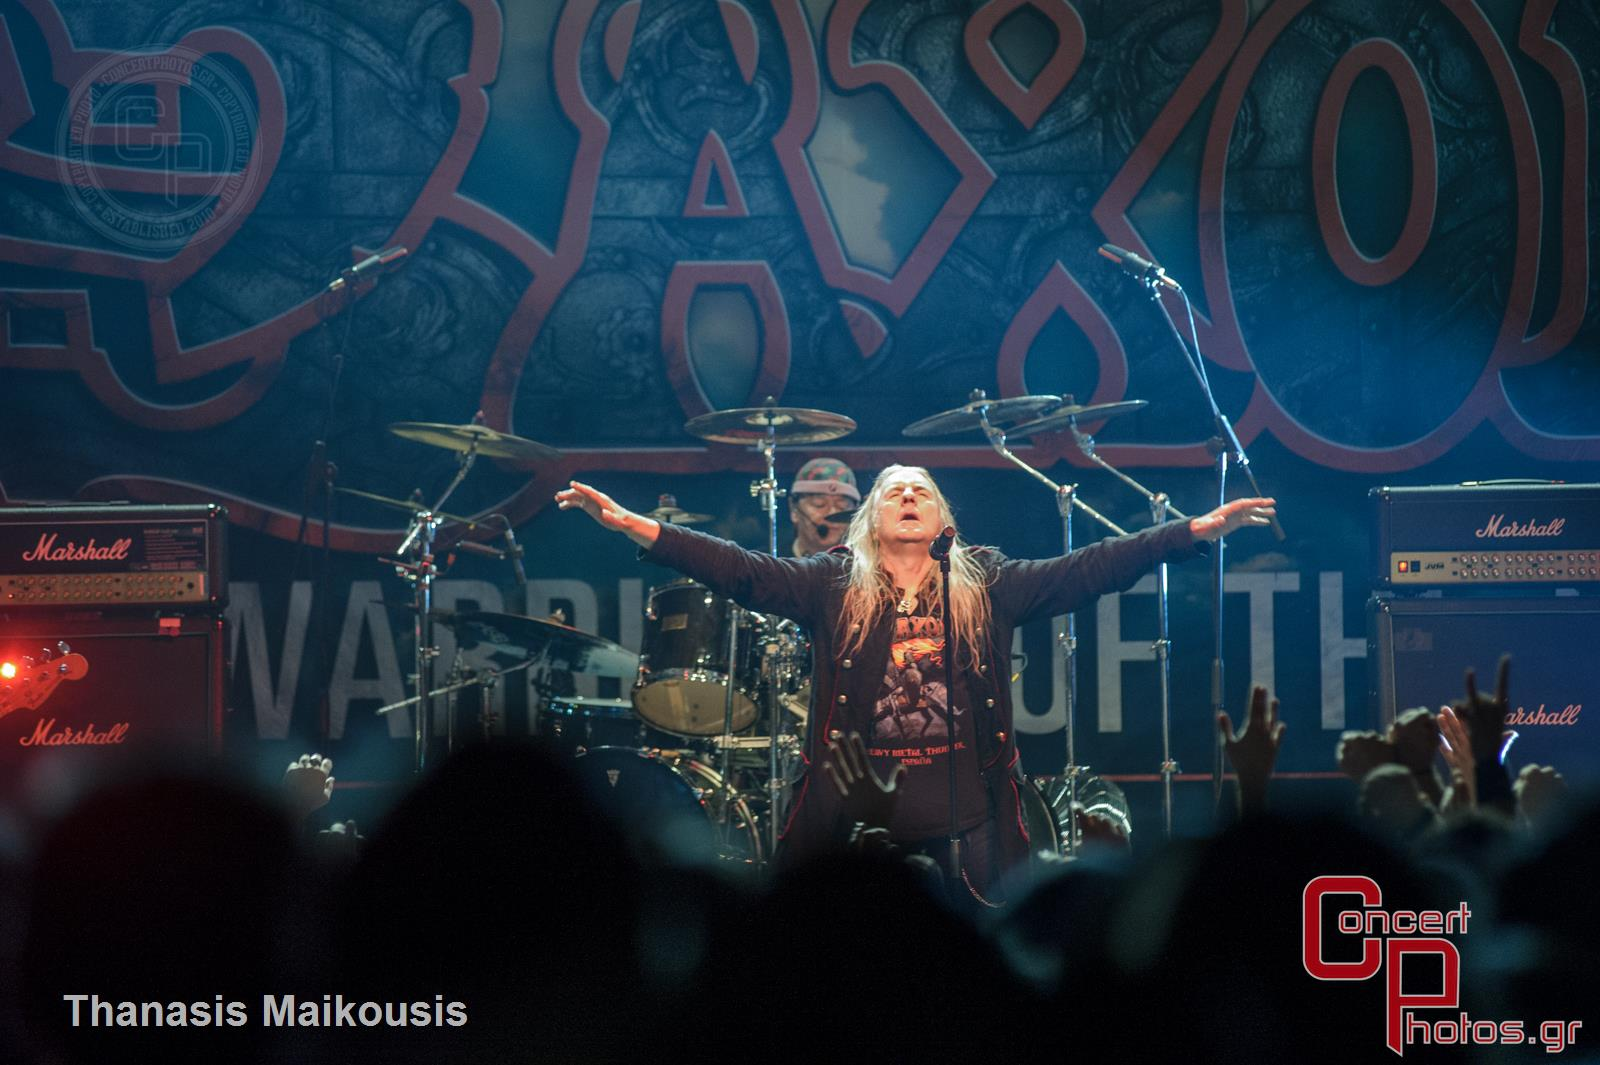 Saxon & Innerwish -Saxon Innerwish Gagarin photographer: Thanasis Maikousis - concertphotos_20141025_23_56_43